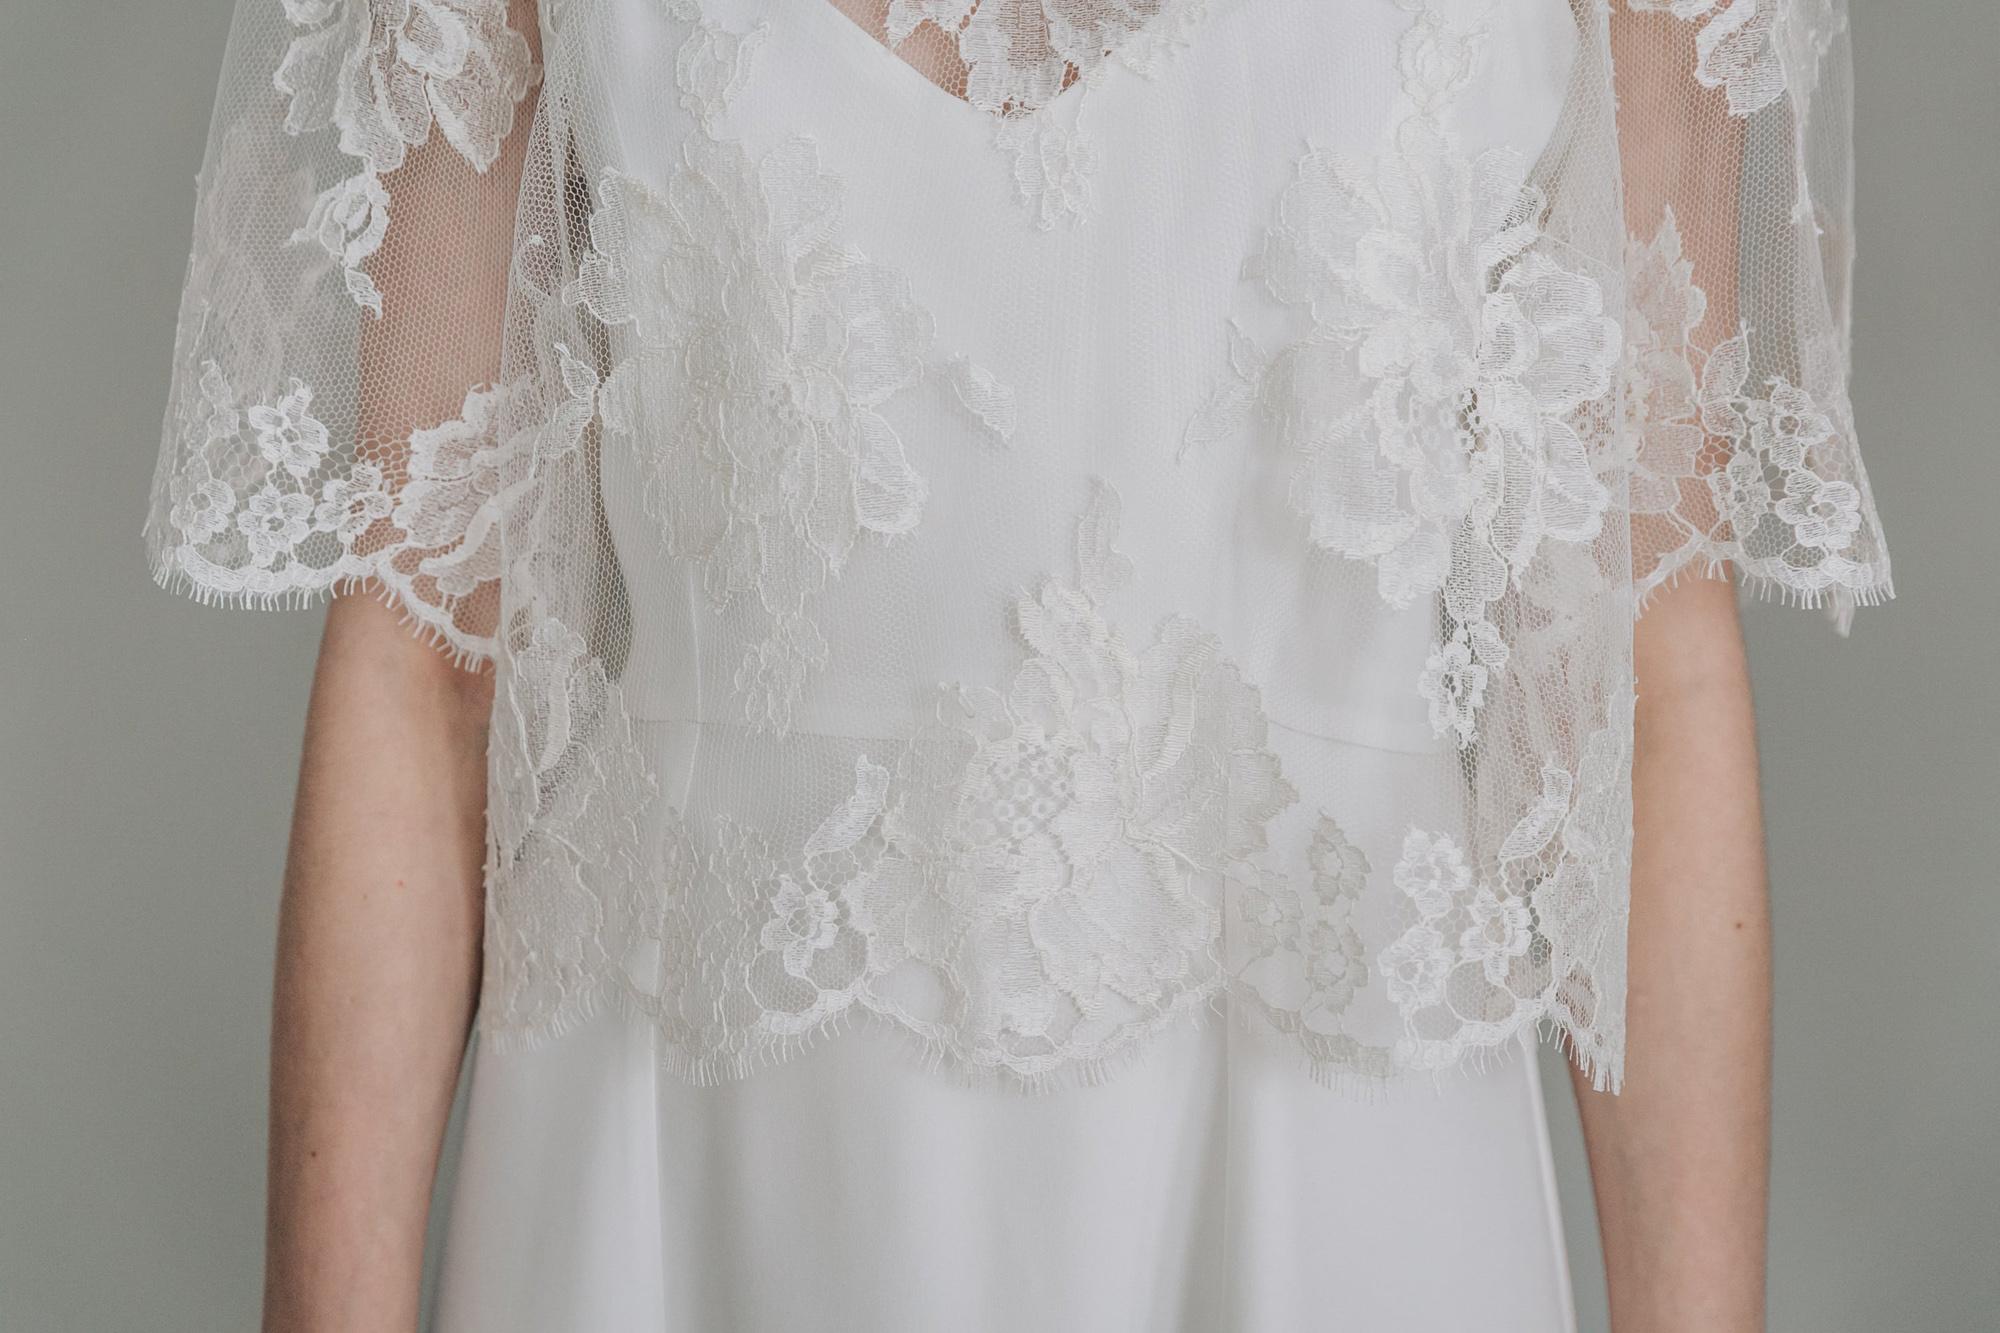 Kate-Beaumont-Sheffield-Rosa-Floral-Lace-Jacket-Snowdrop-Ivory-Matt-Silk-Modern-Wedding-Gown-6.jpg